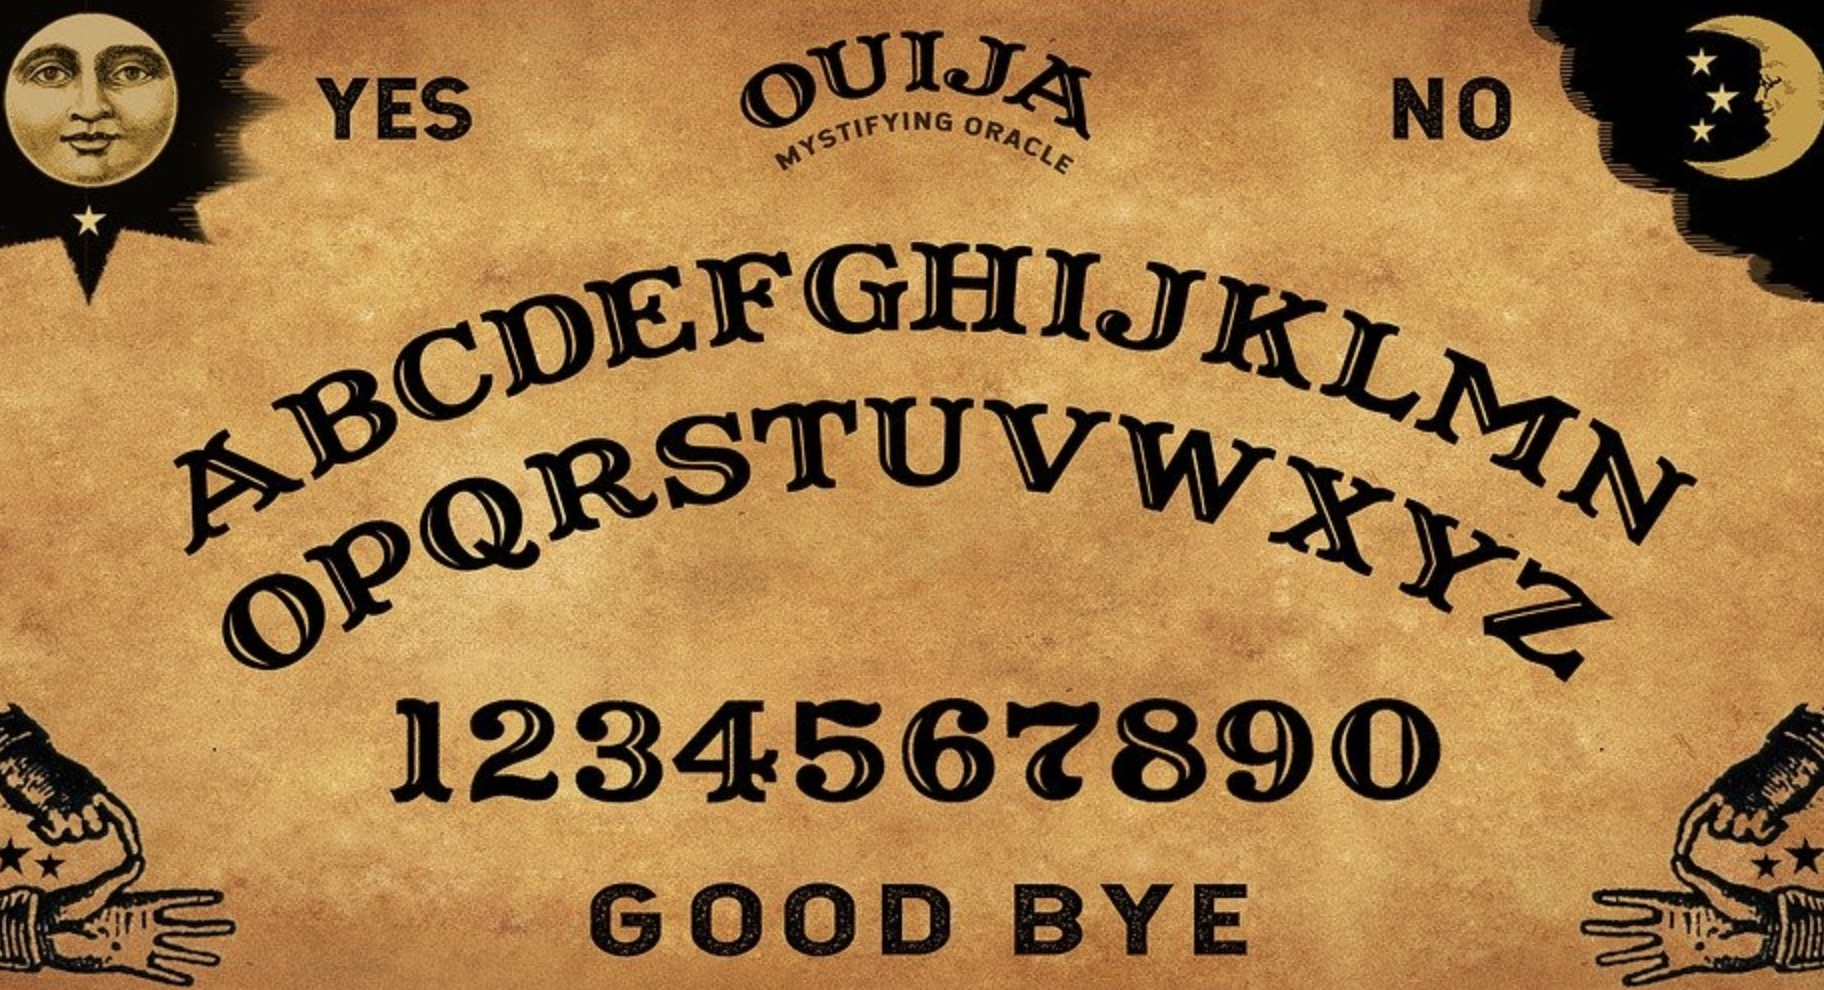 la planche Ouija